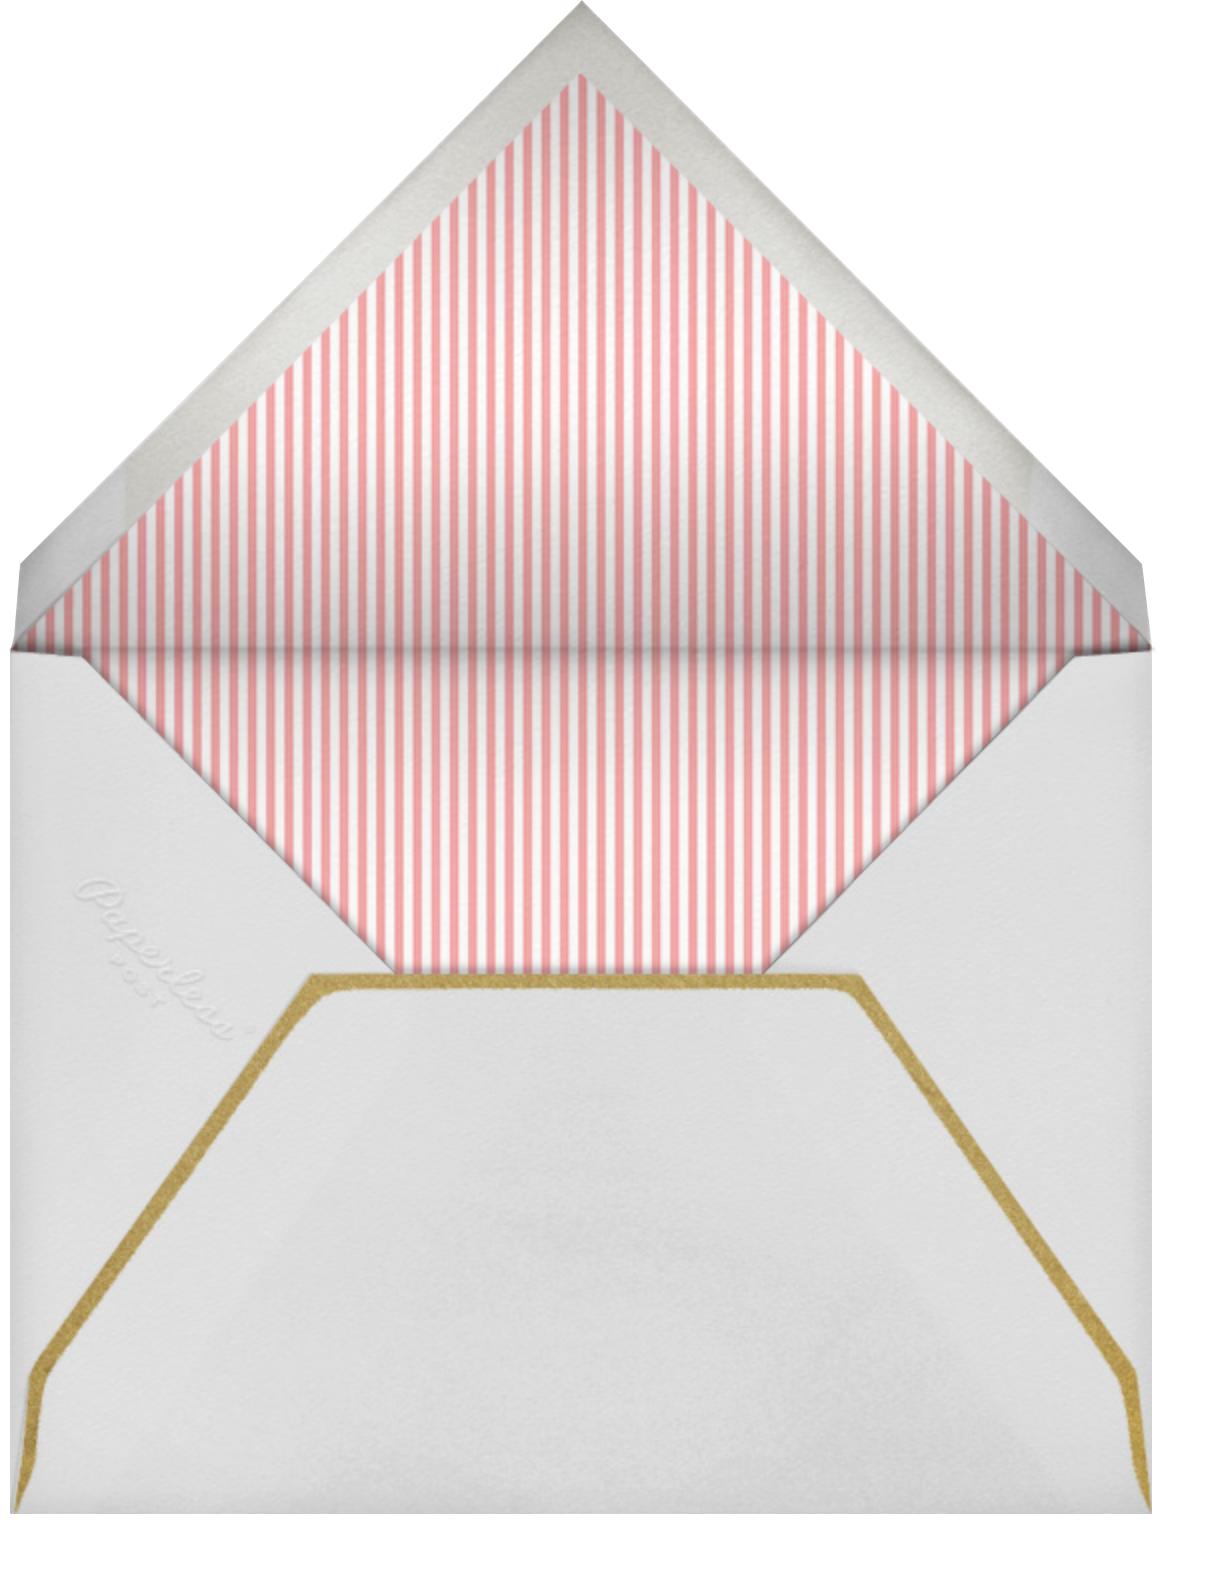 Four Fine Flowers - Little Cube - Birth - envelope back